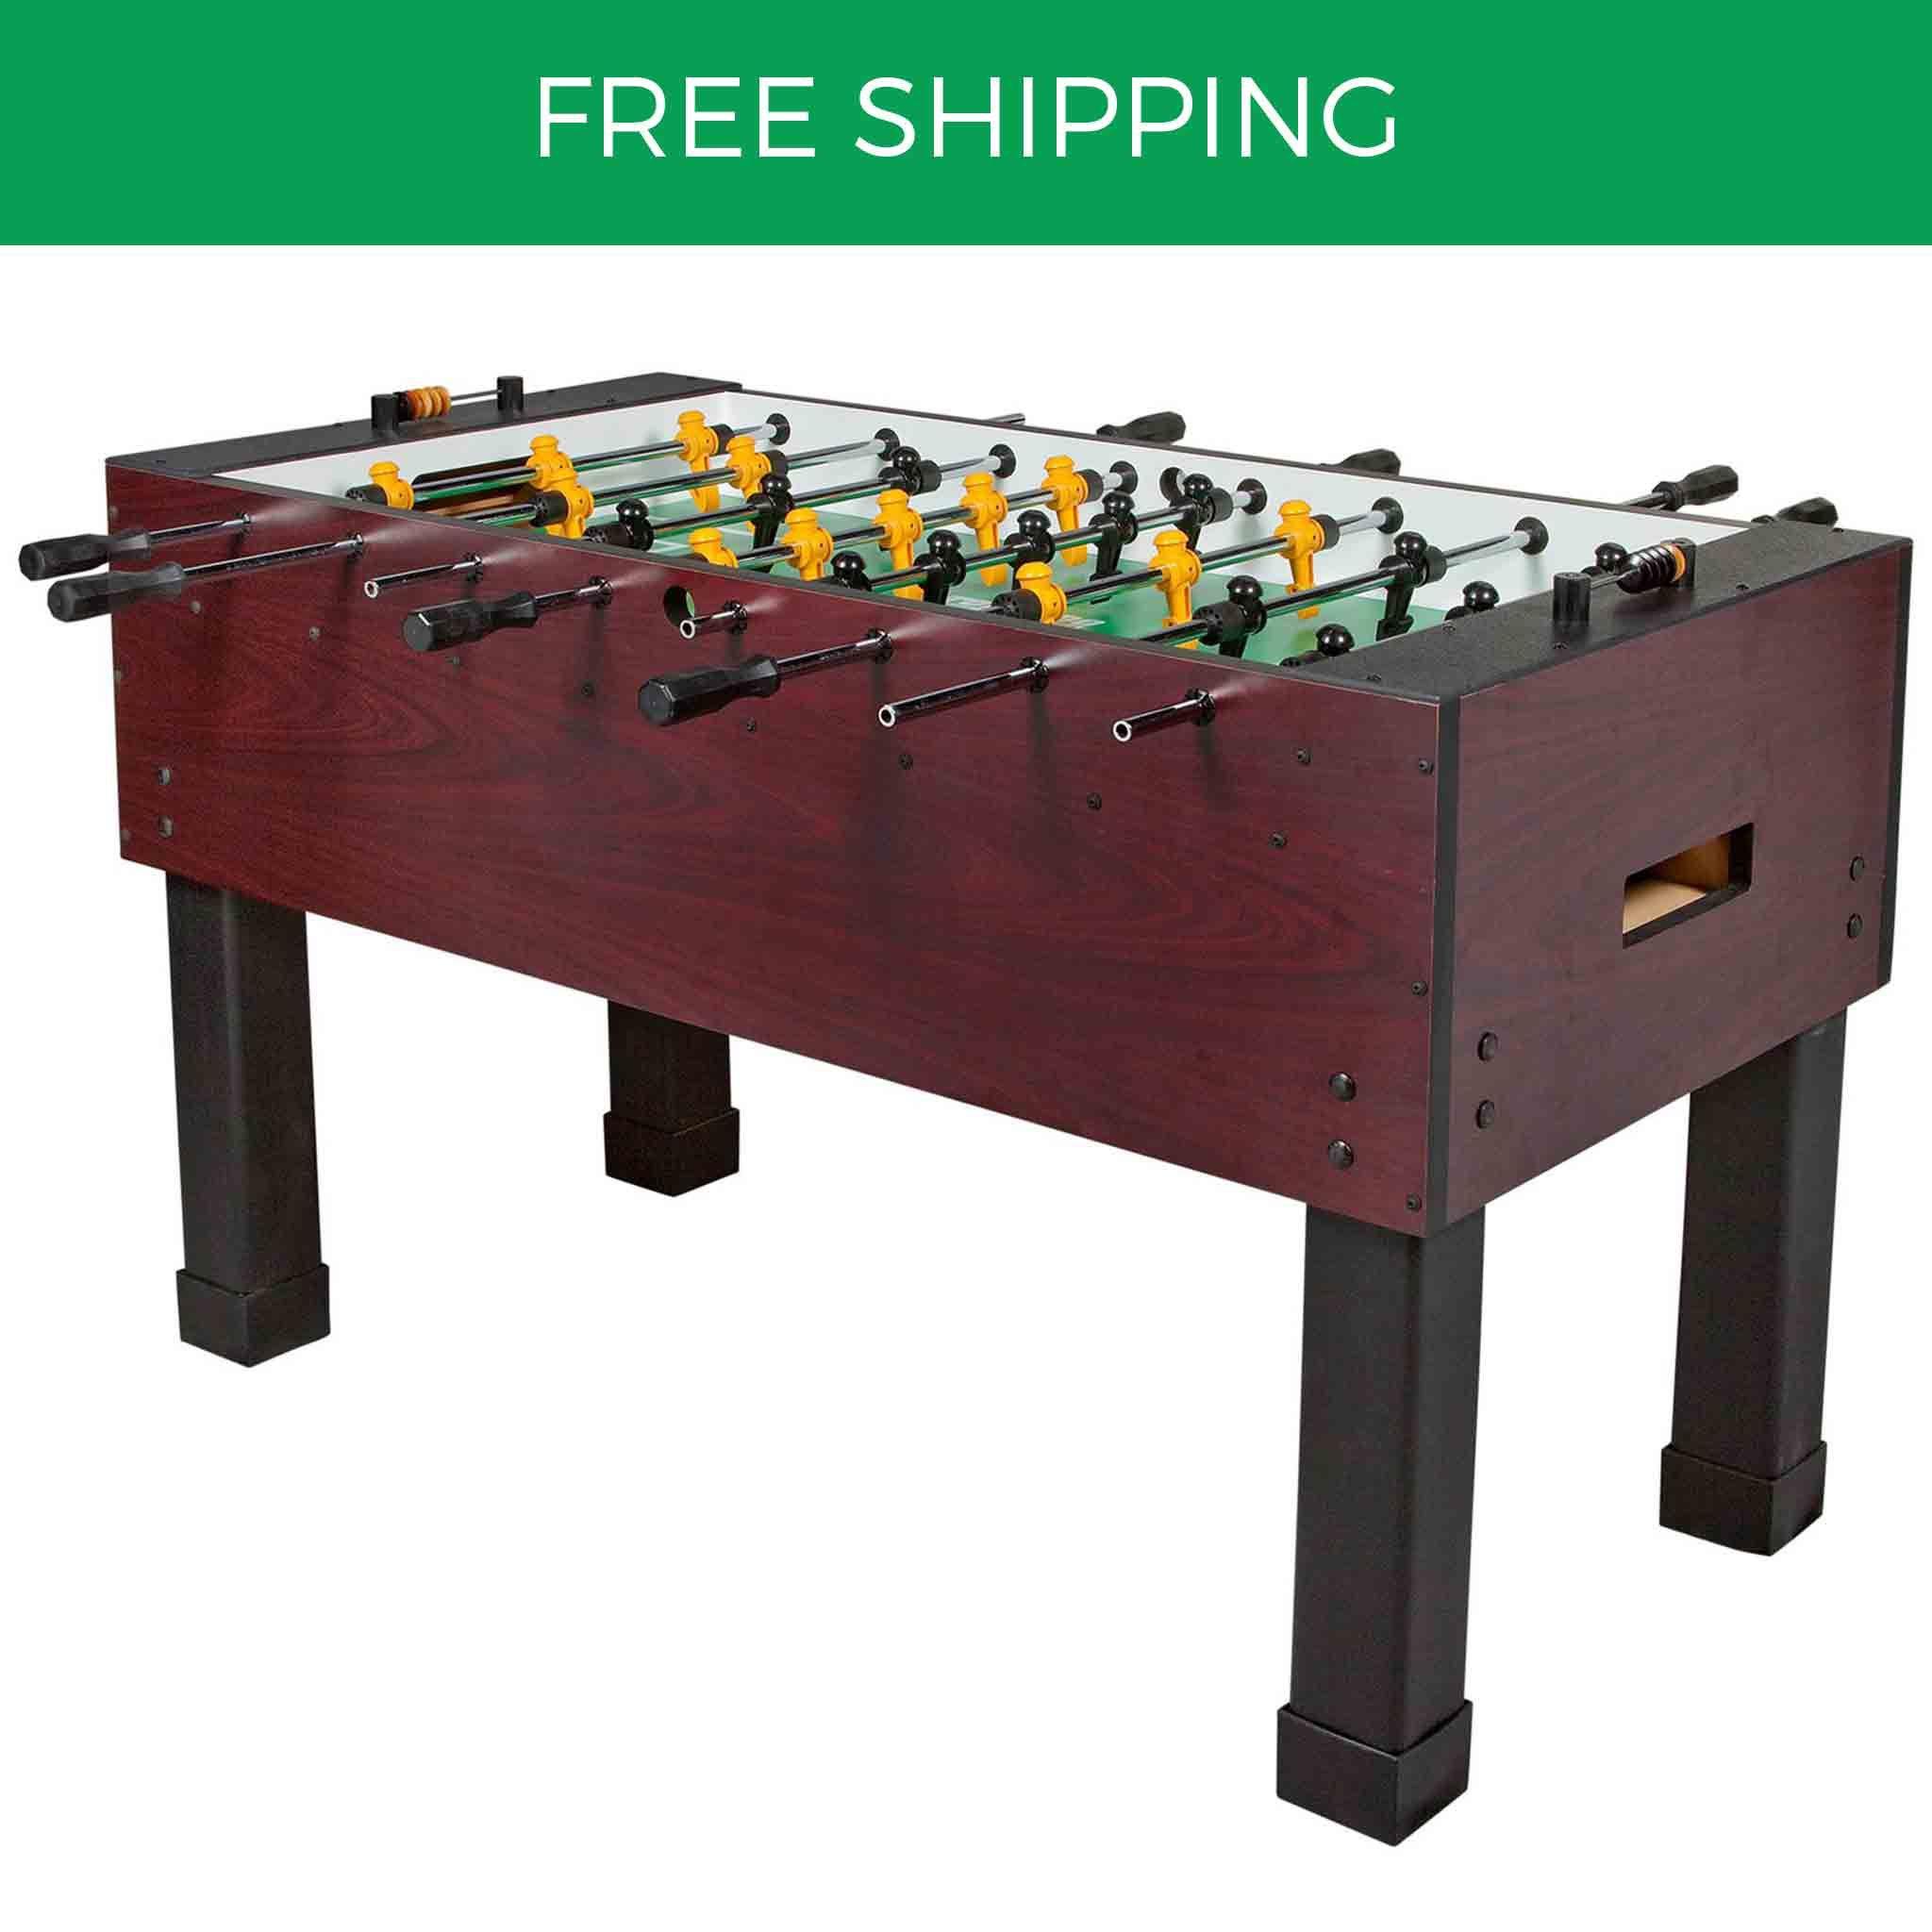 Tornado Sport Foosball Table Free Shipping, http//www